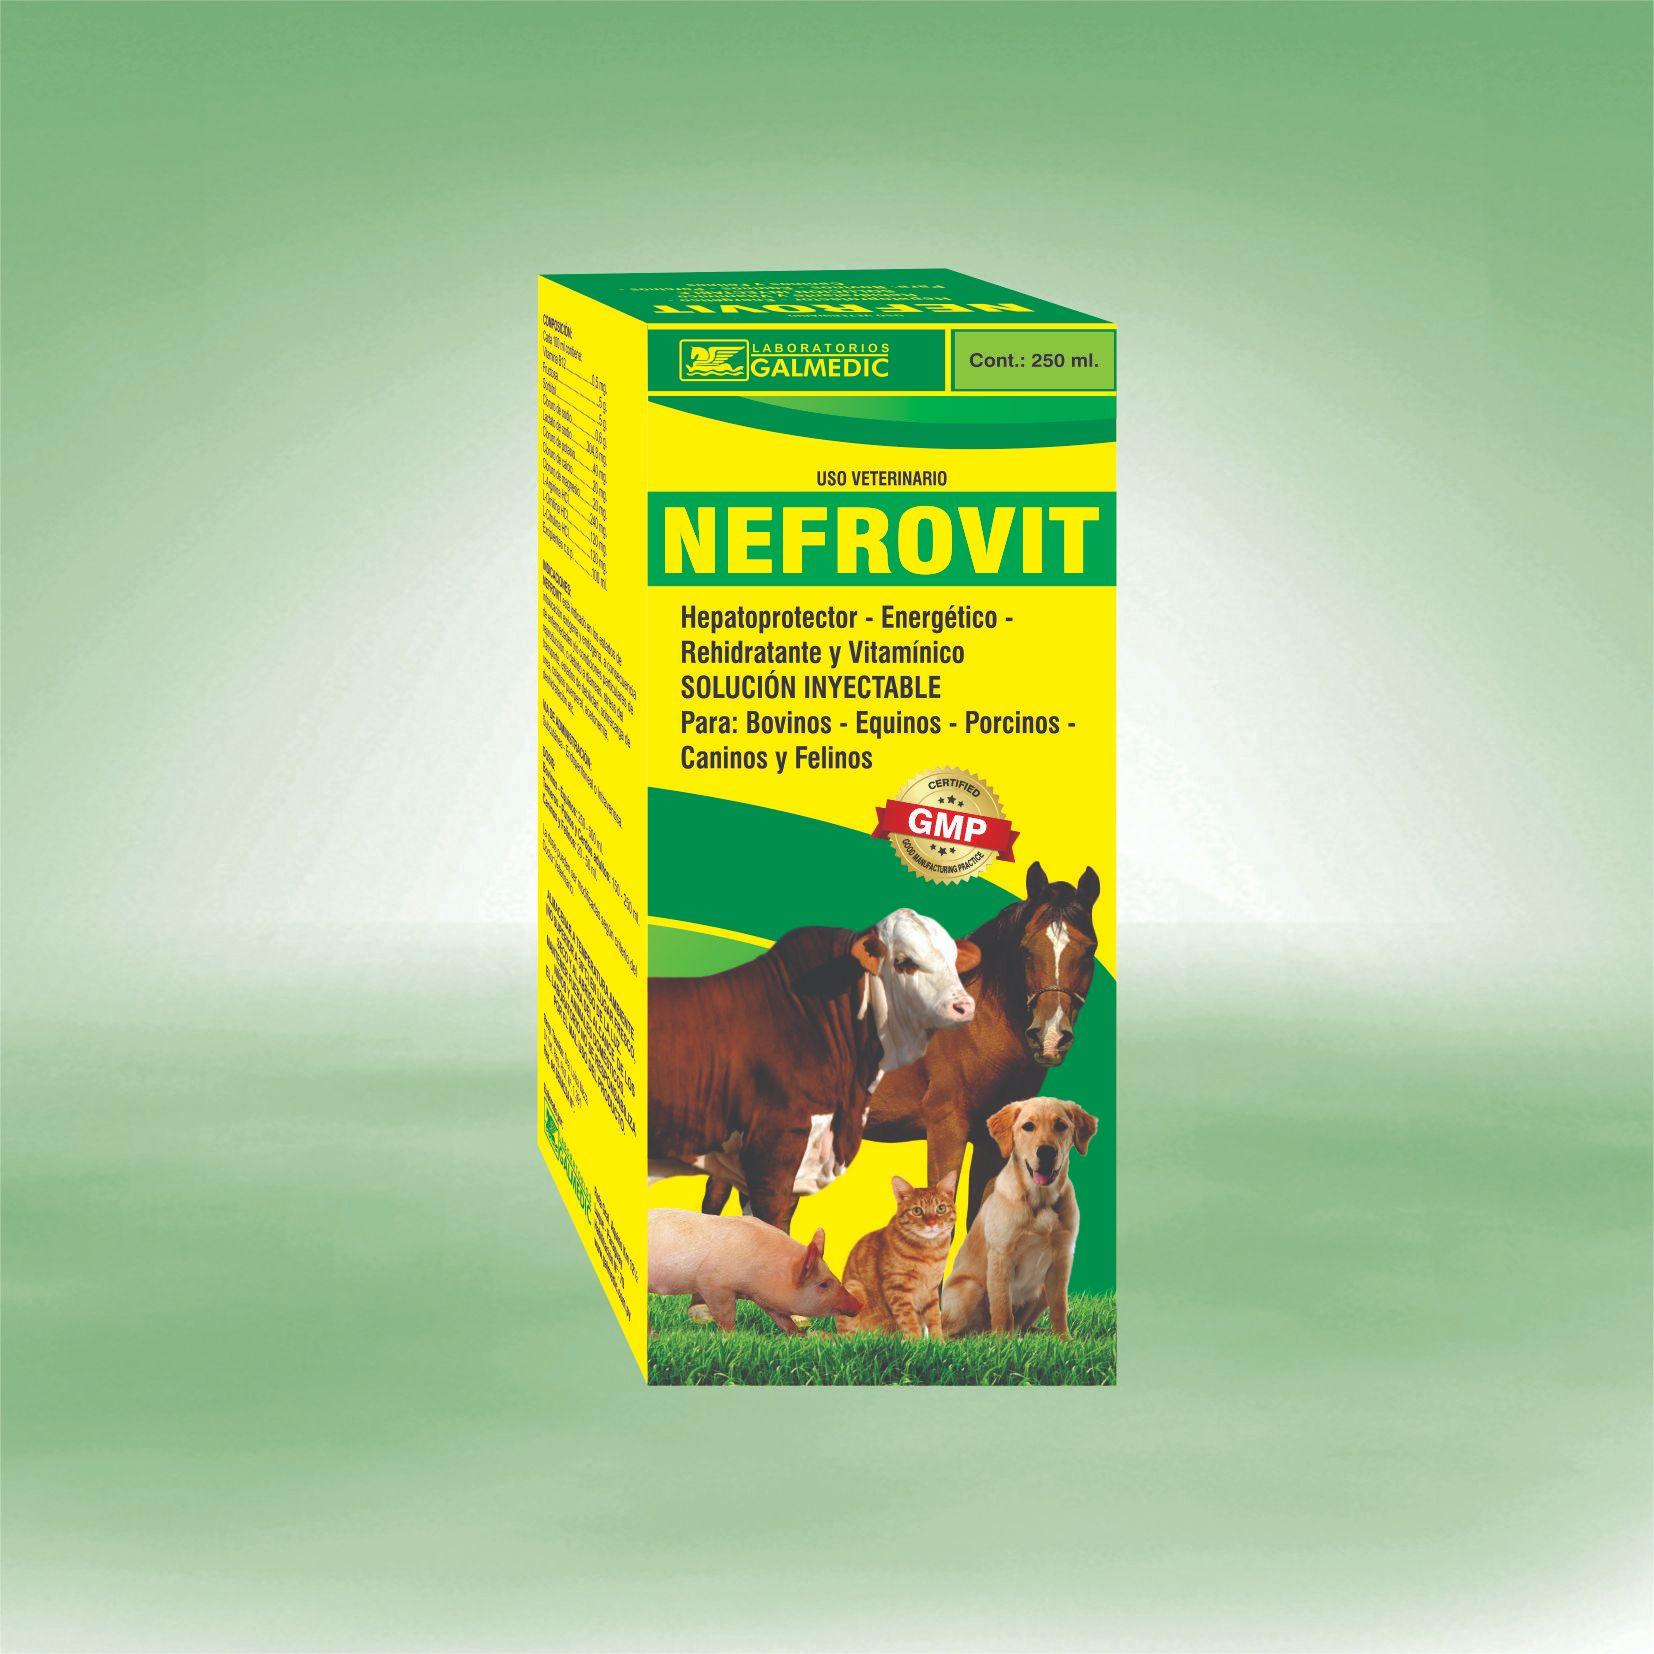 NEFROVIT